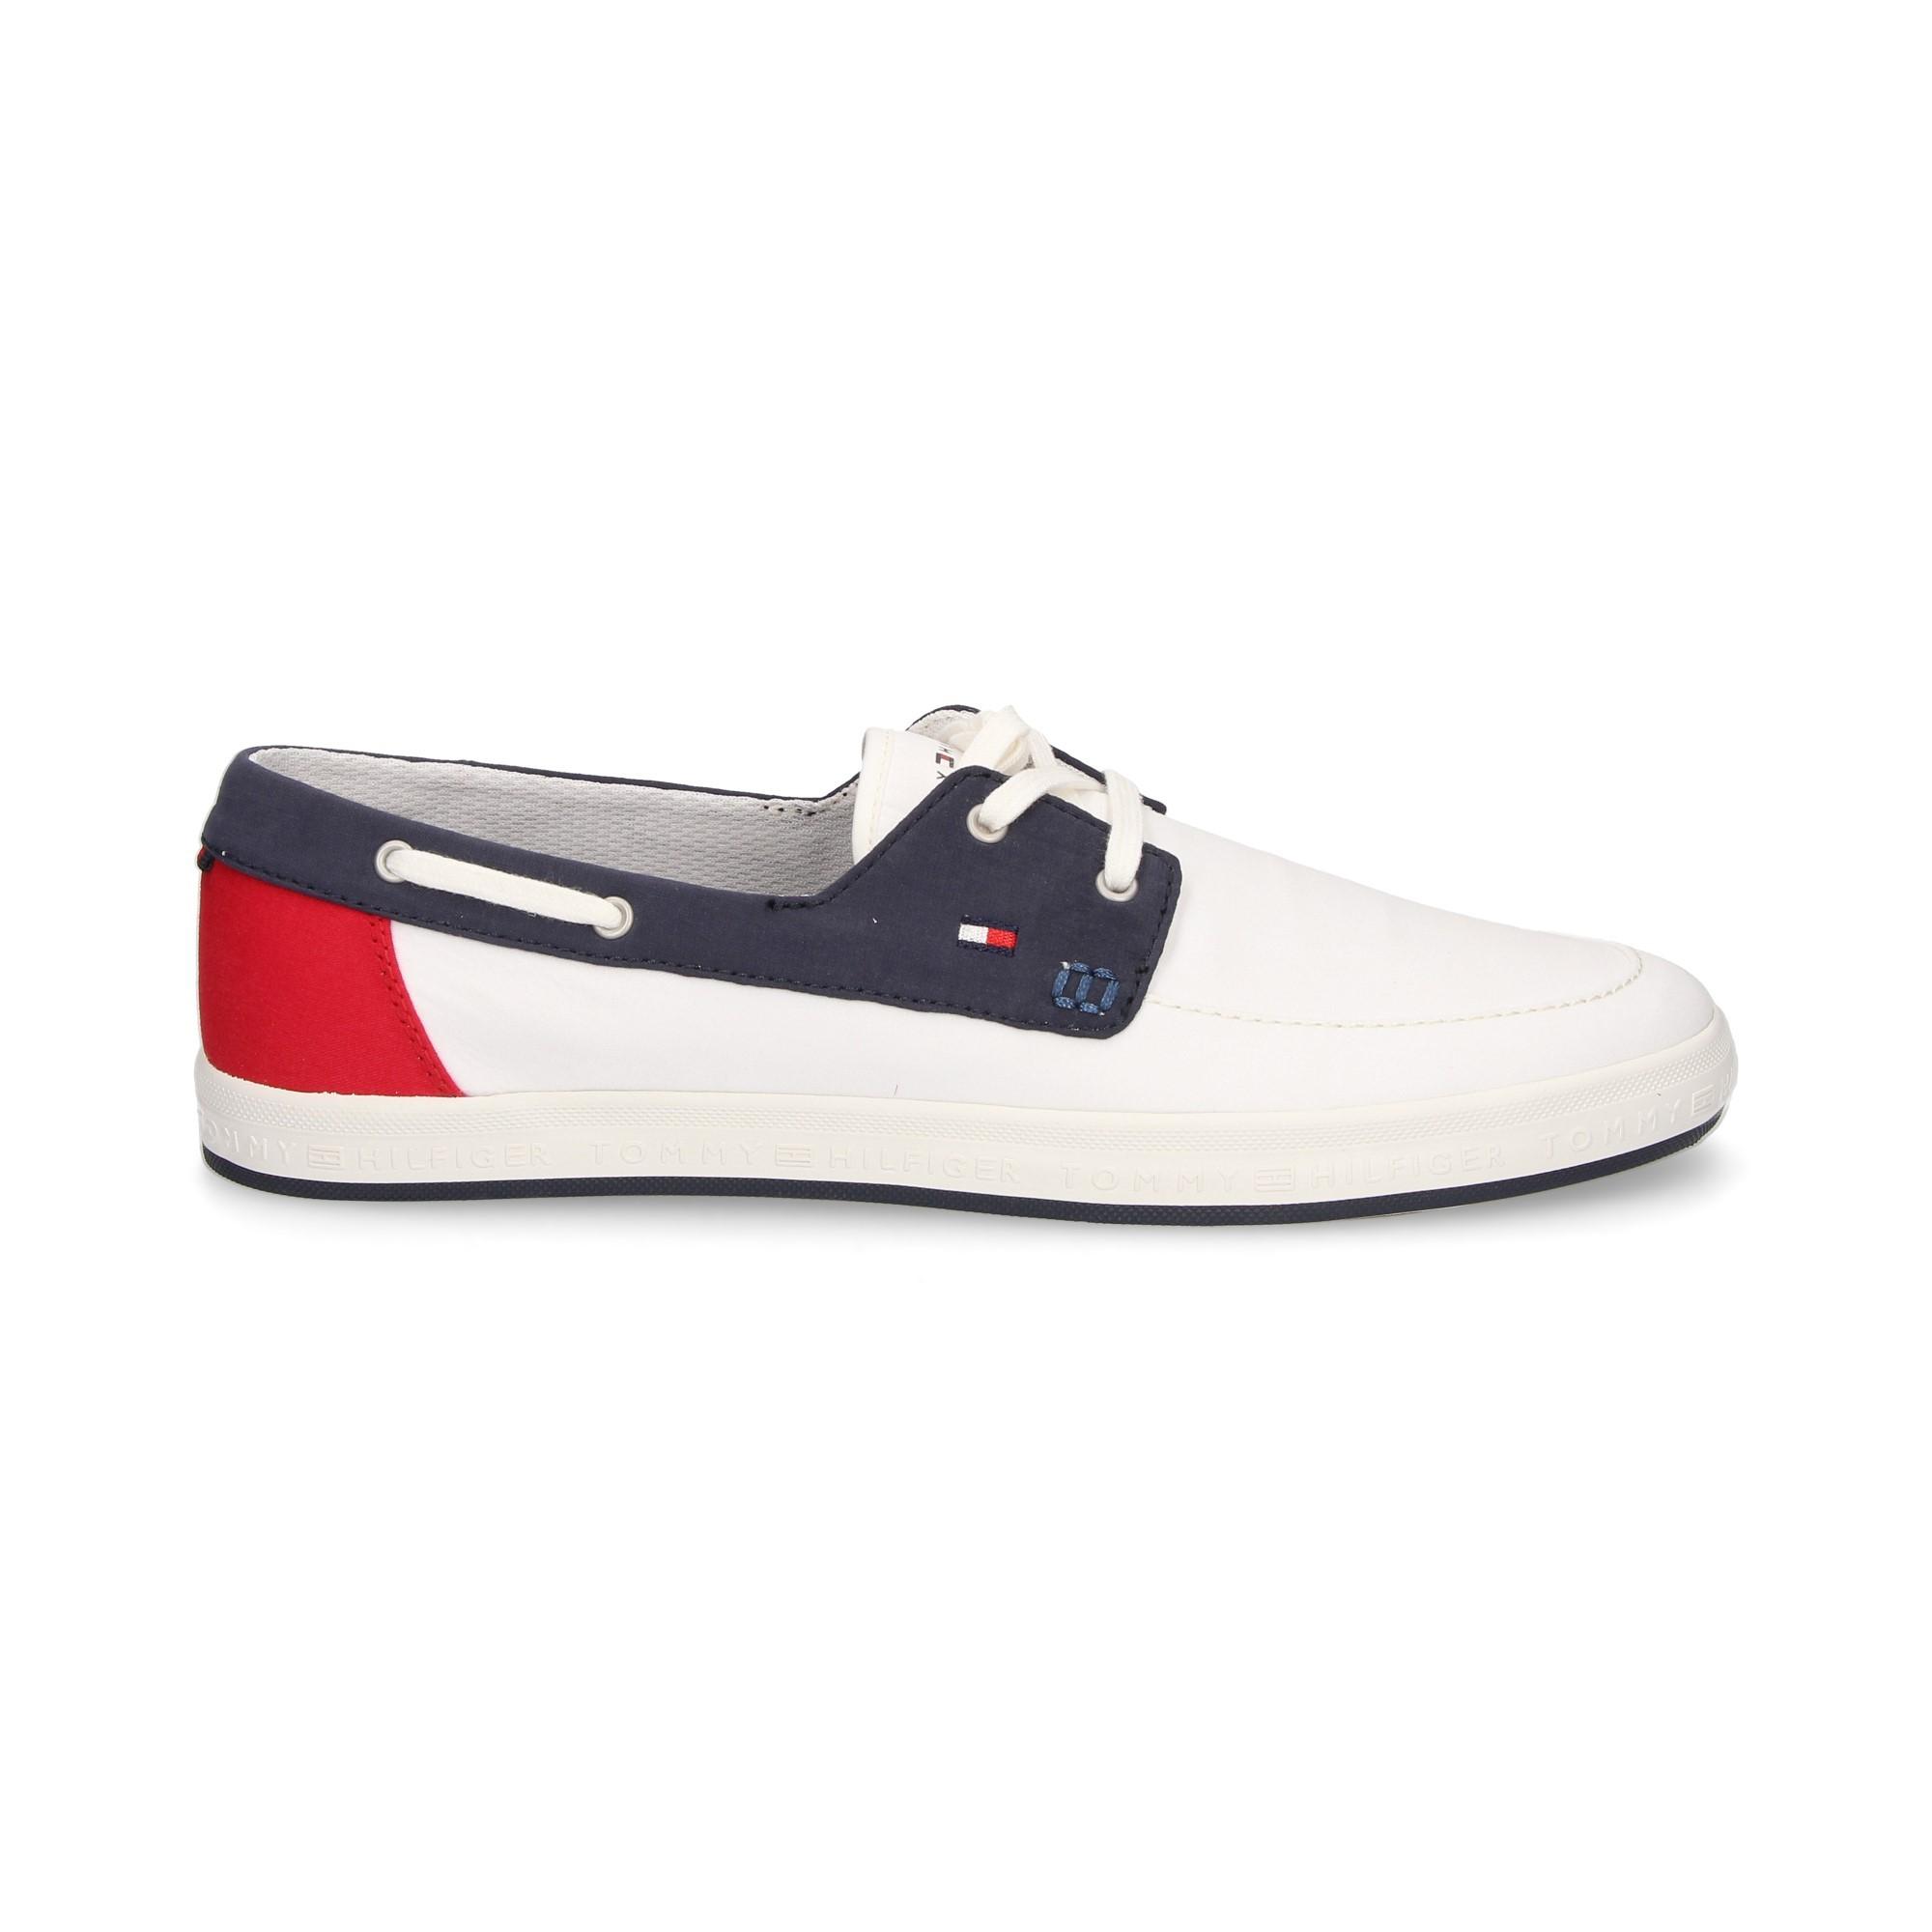 nautico-textil-rojo-azul-blanco